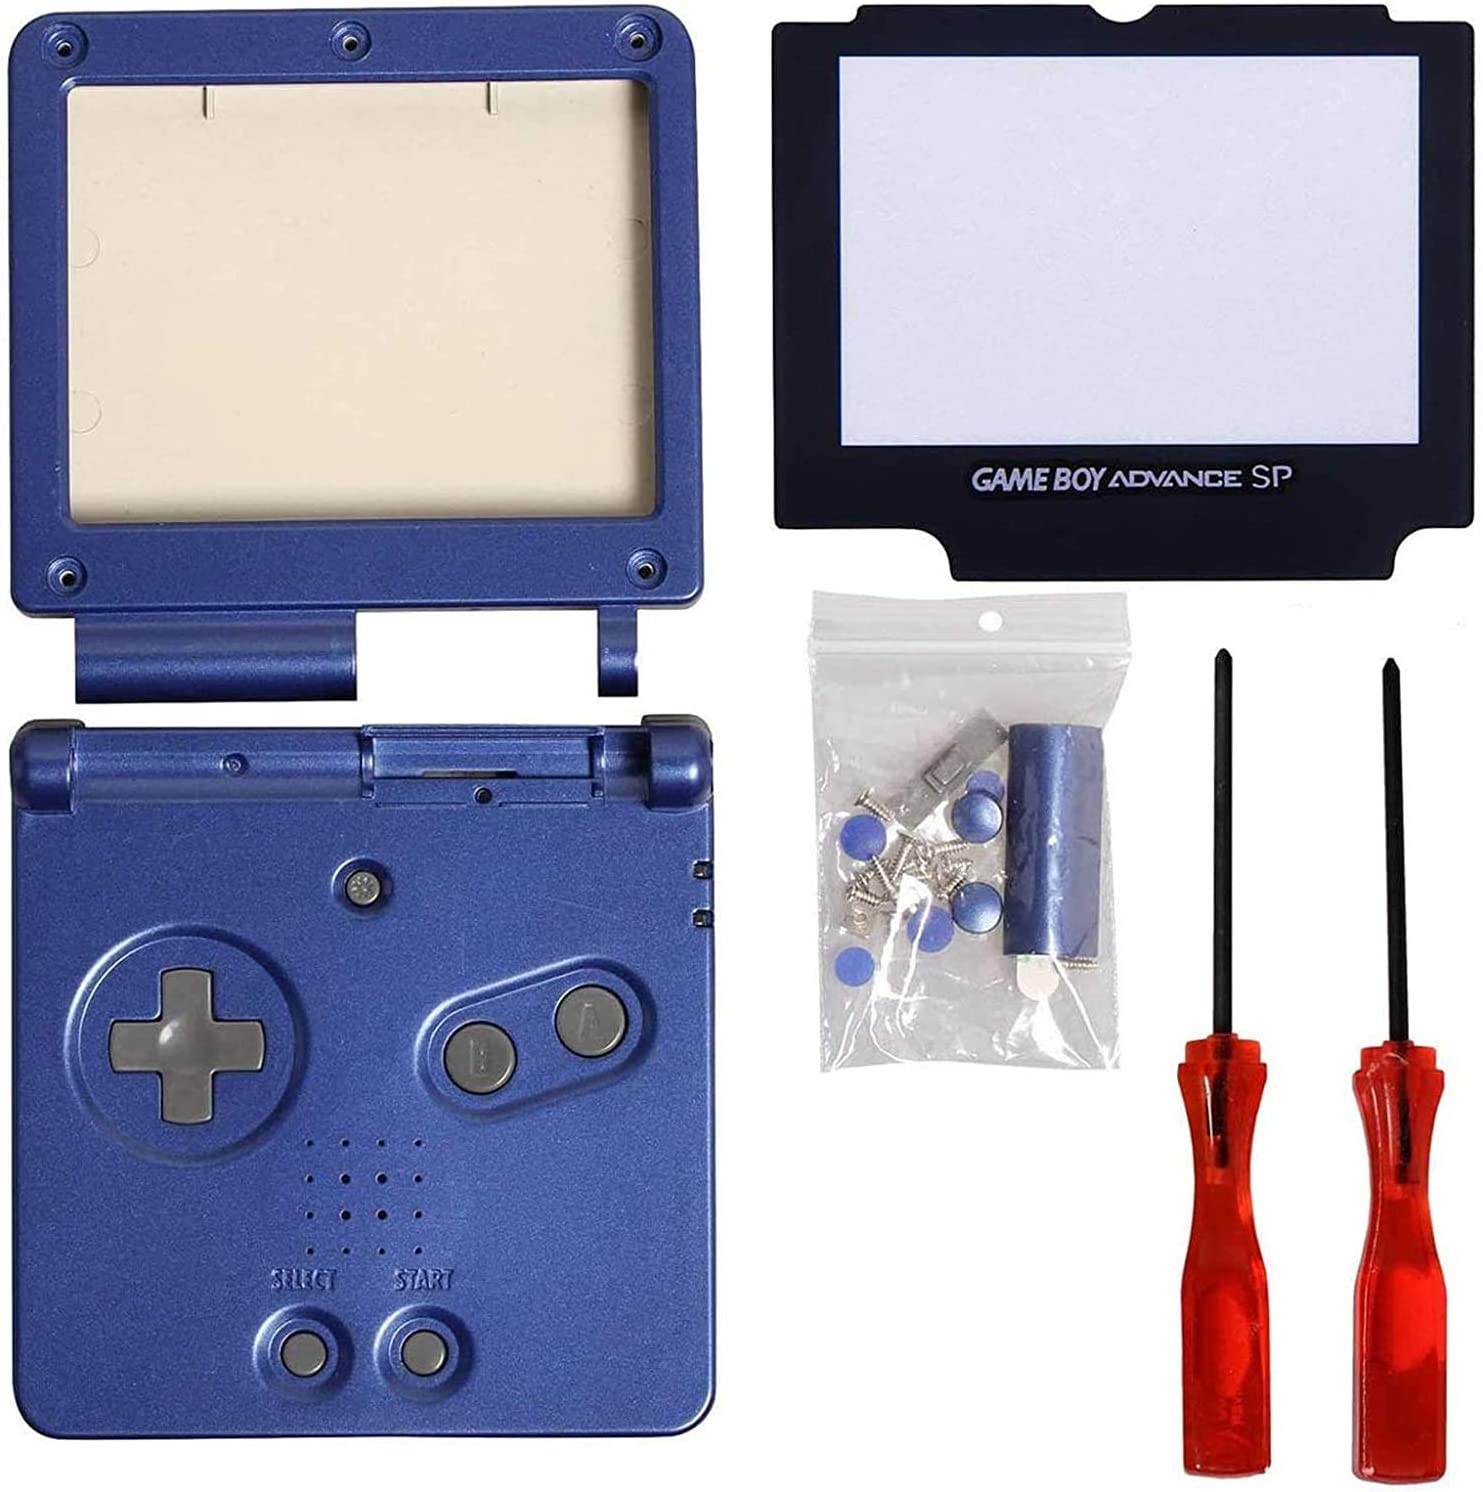 Timorn Shell Caso Completo de la Cubierta Cover + Protector de la Pantalla Parte + Tri-ala reparación + Cruz Destornillador para Gameboy Advance GBA (Paquete Azul)